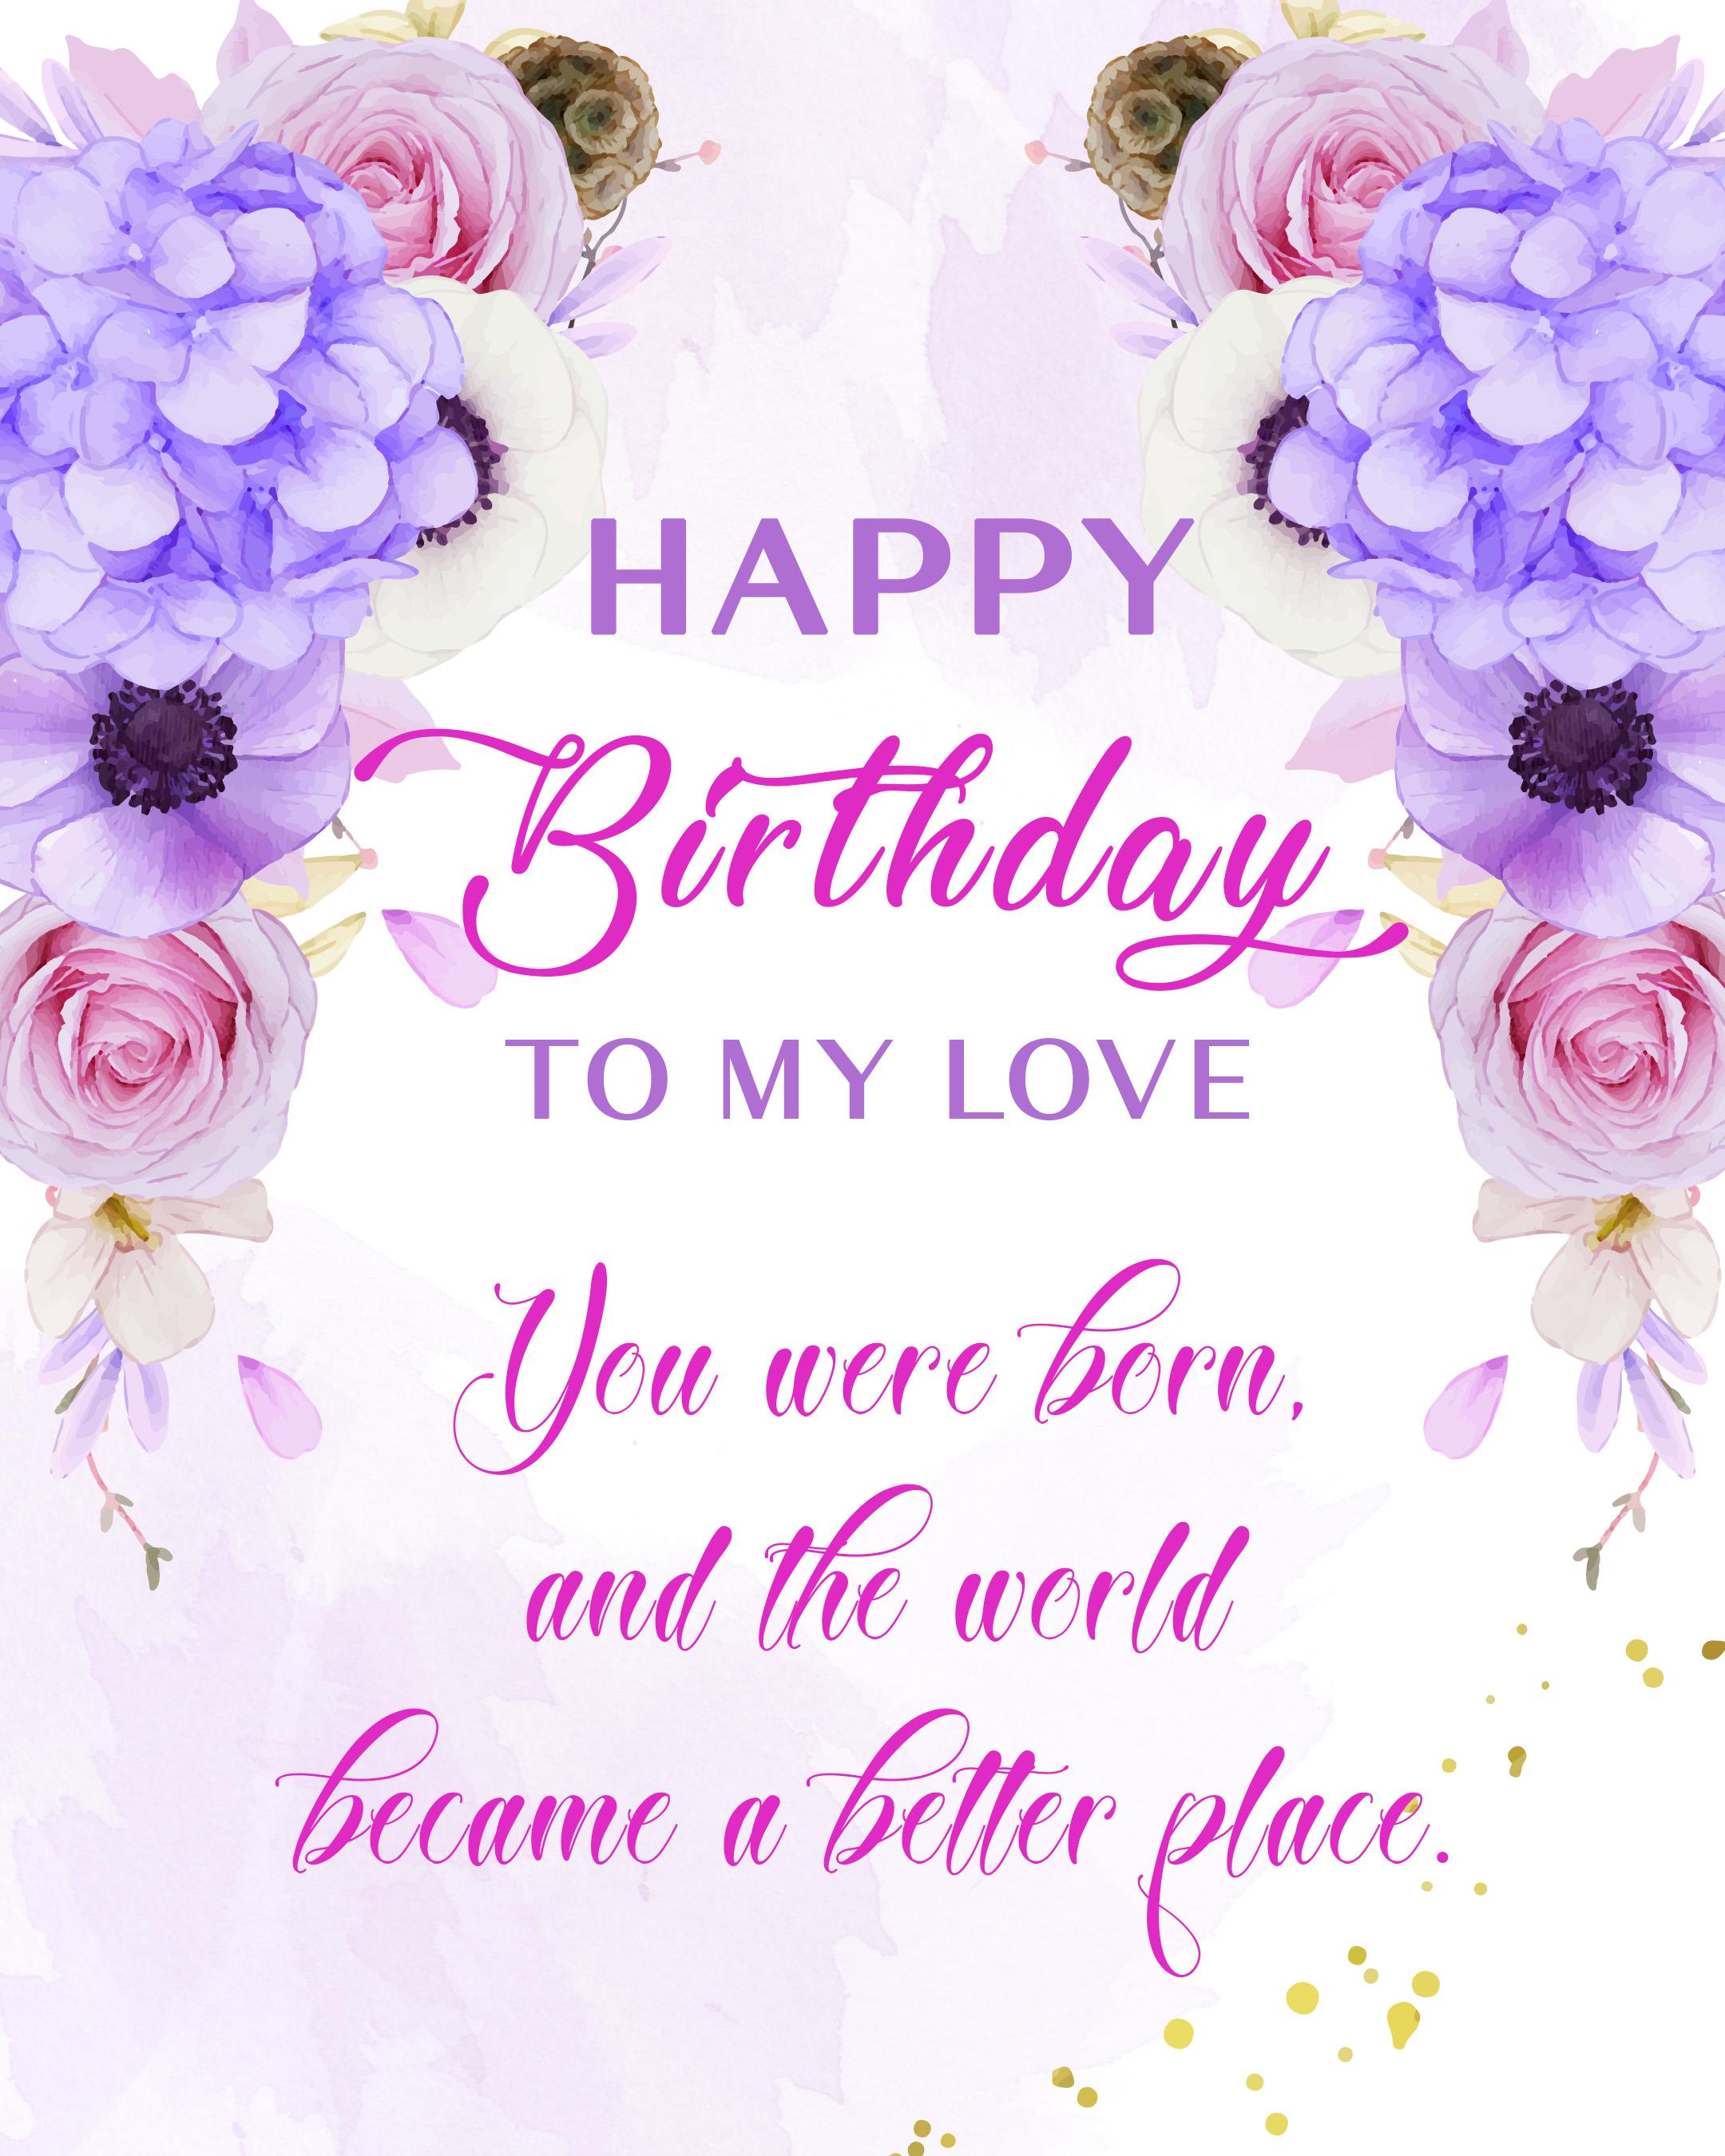 Free Happy Birthday Image With Love - birthdayimg.com